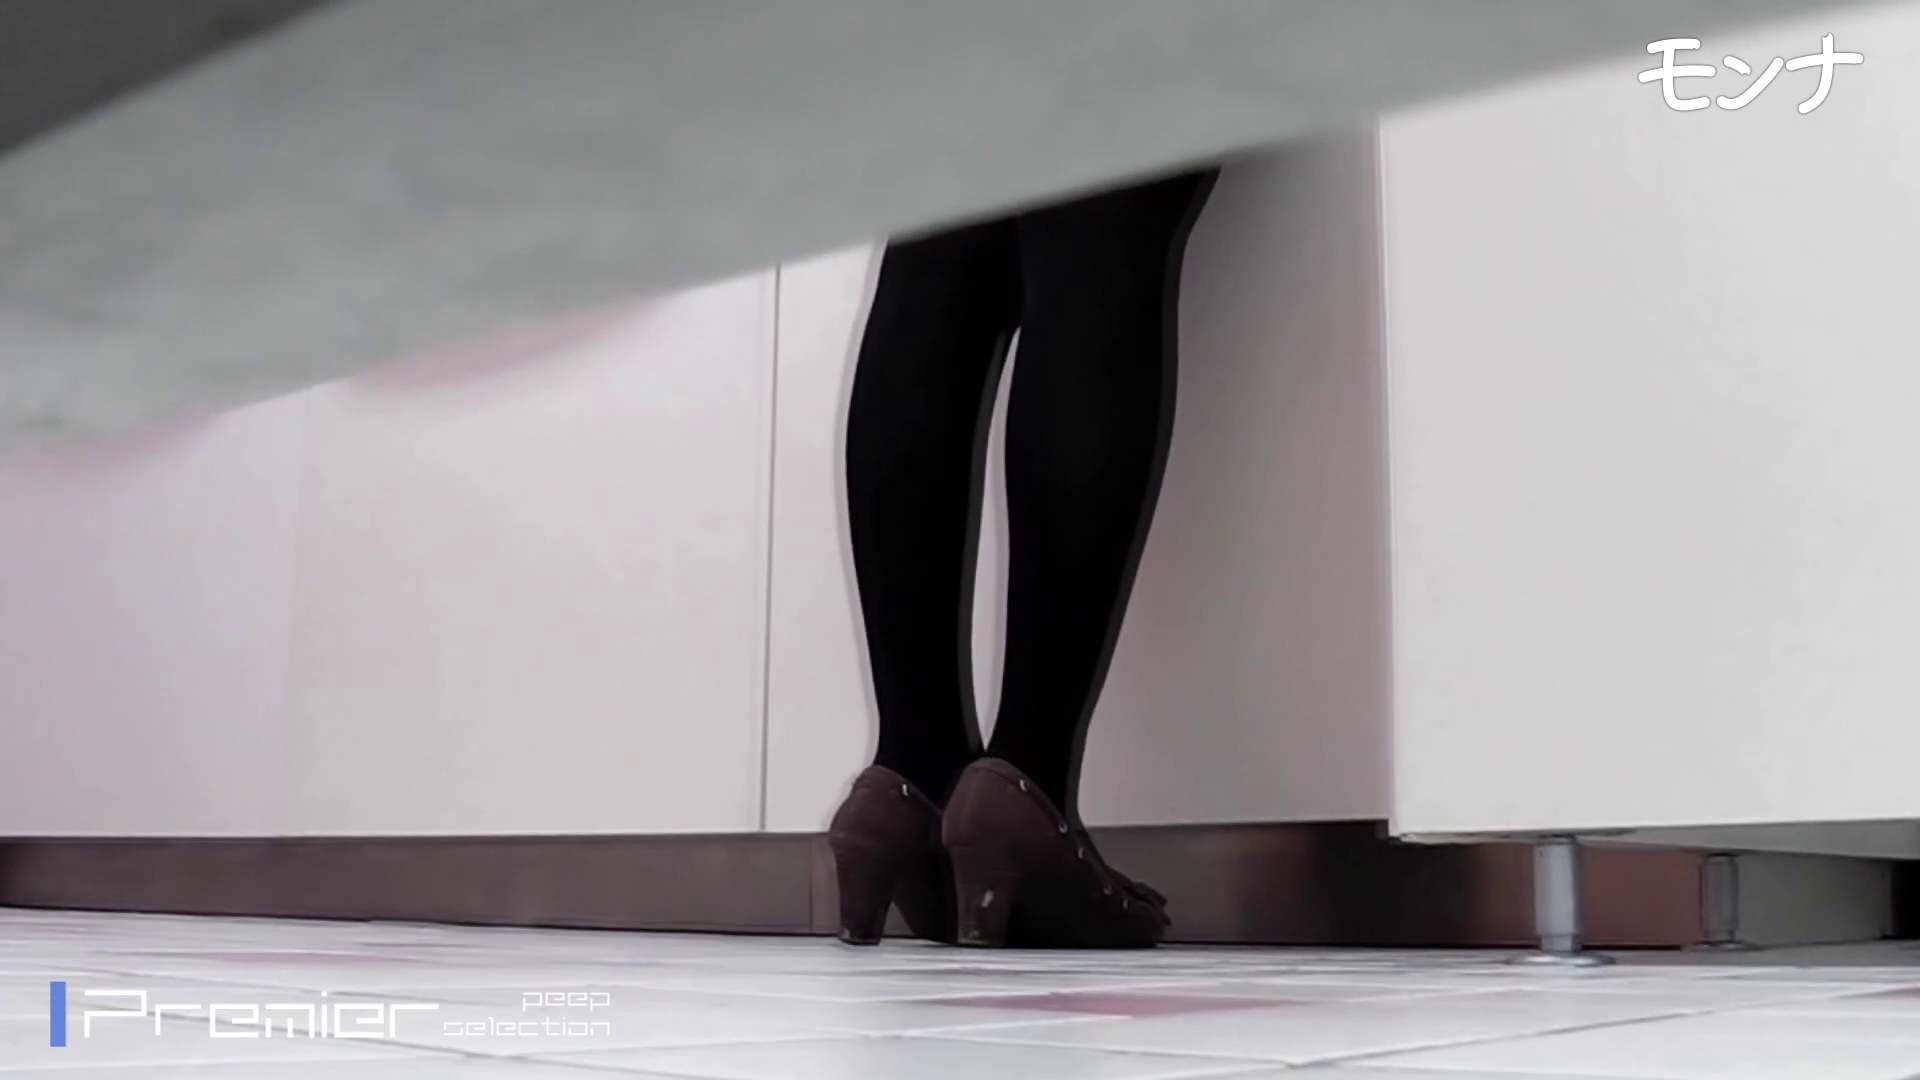 CM 悶絶シリーズ5 【美しい日本の未来 No.128】 丸出しマンコ われめAV動画紹介 38連発 8